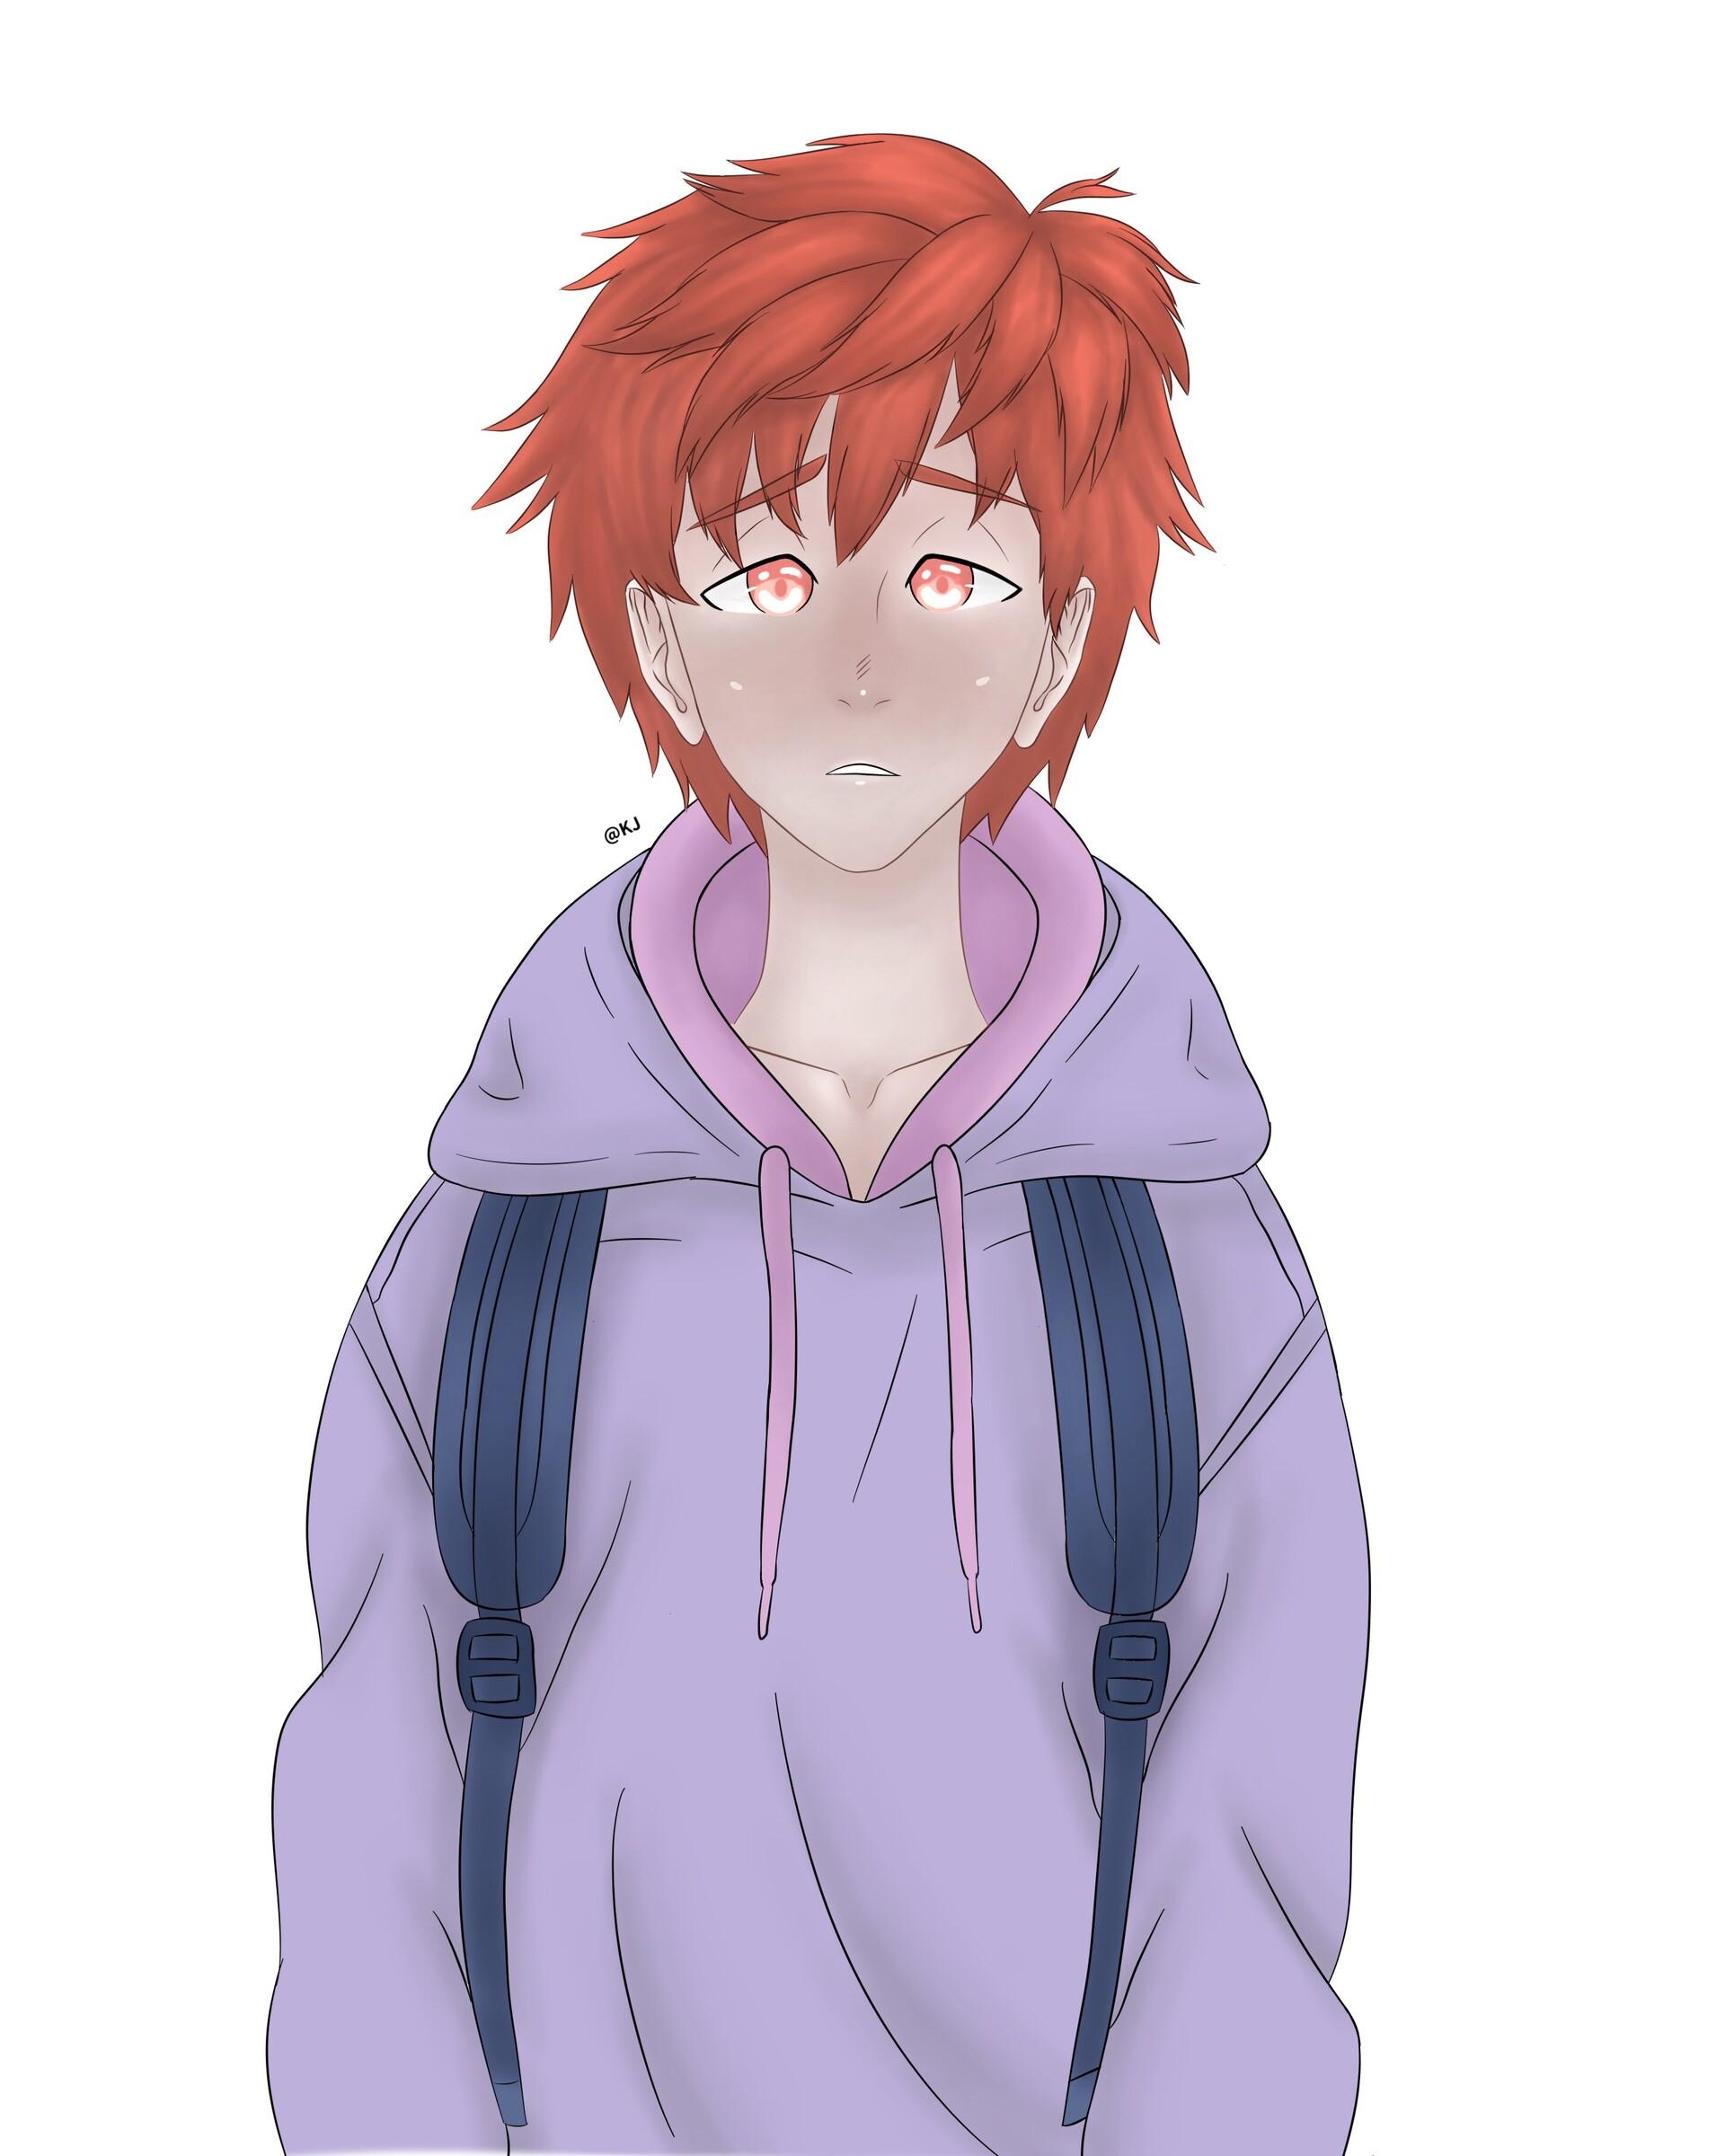 Artstation Cute Anime Boy Kai Lorben